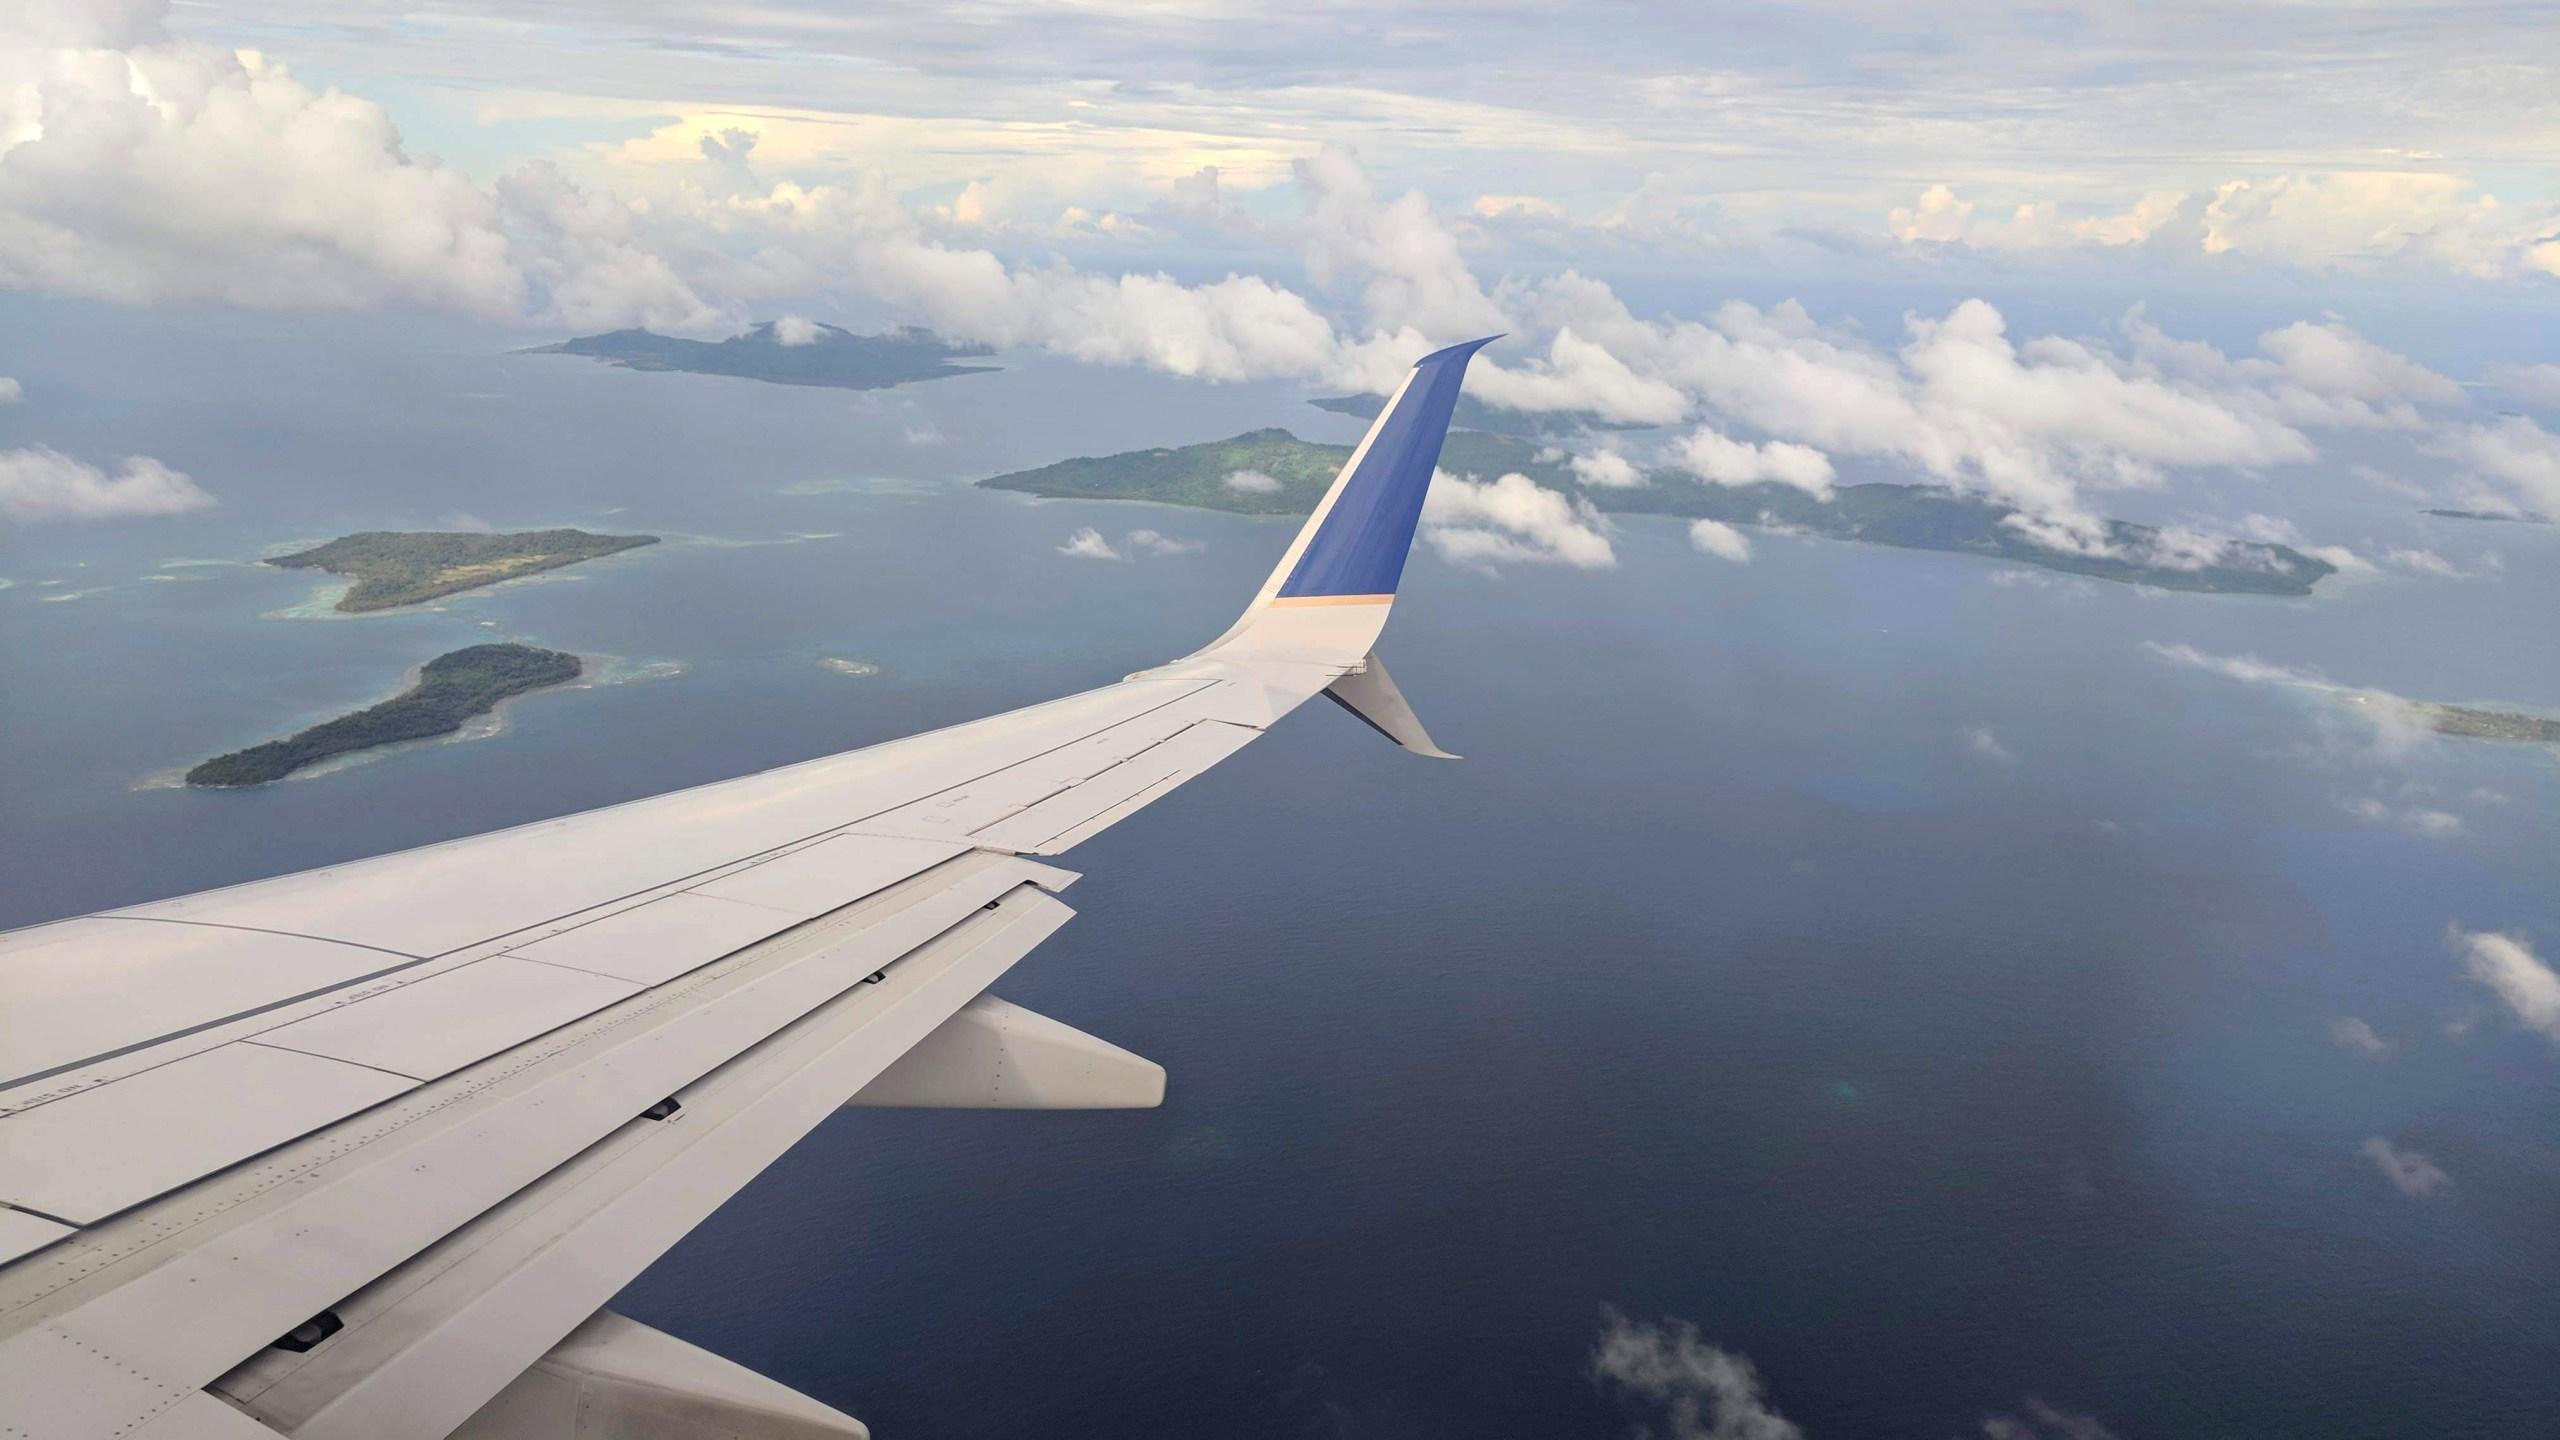 Micronesia_Plane_Crash_33521-159532.jpg95222331